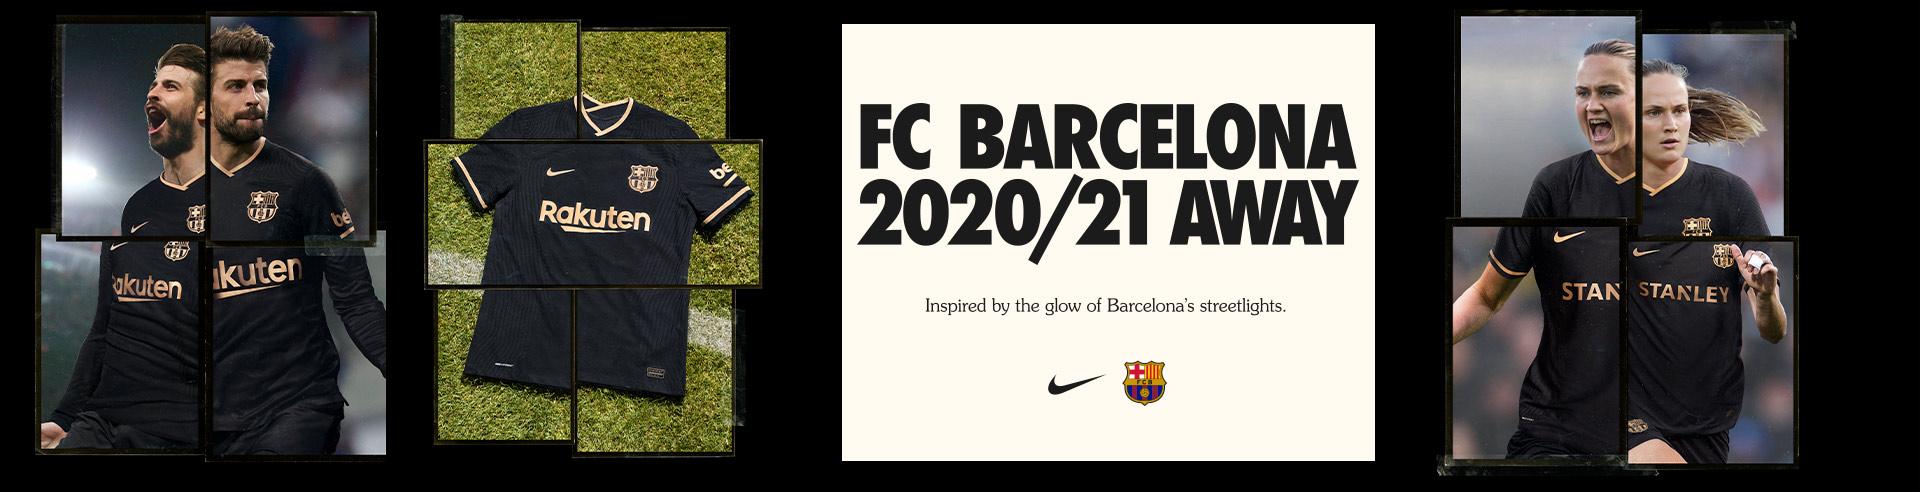 NIKE FC BARCELONA NEW AWAY KIT 2020 2021 JULIO 2020 ES MX